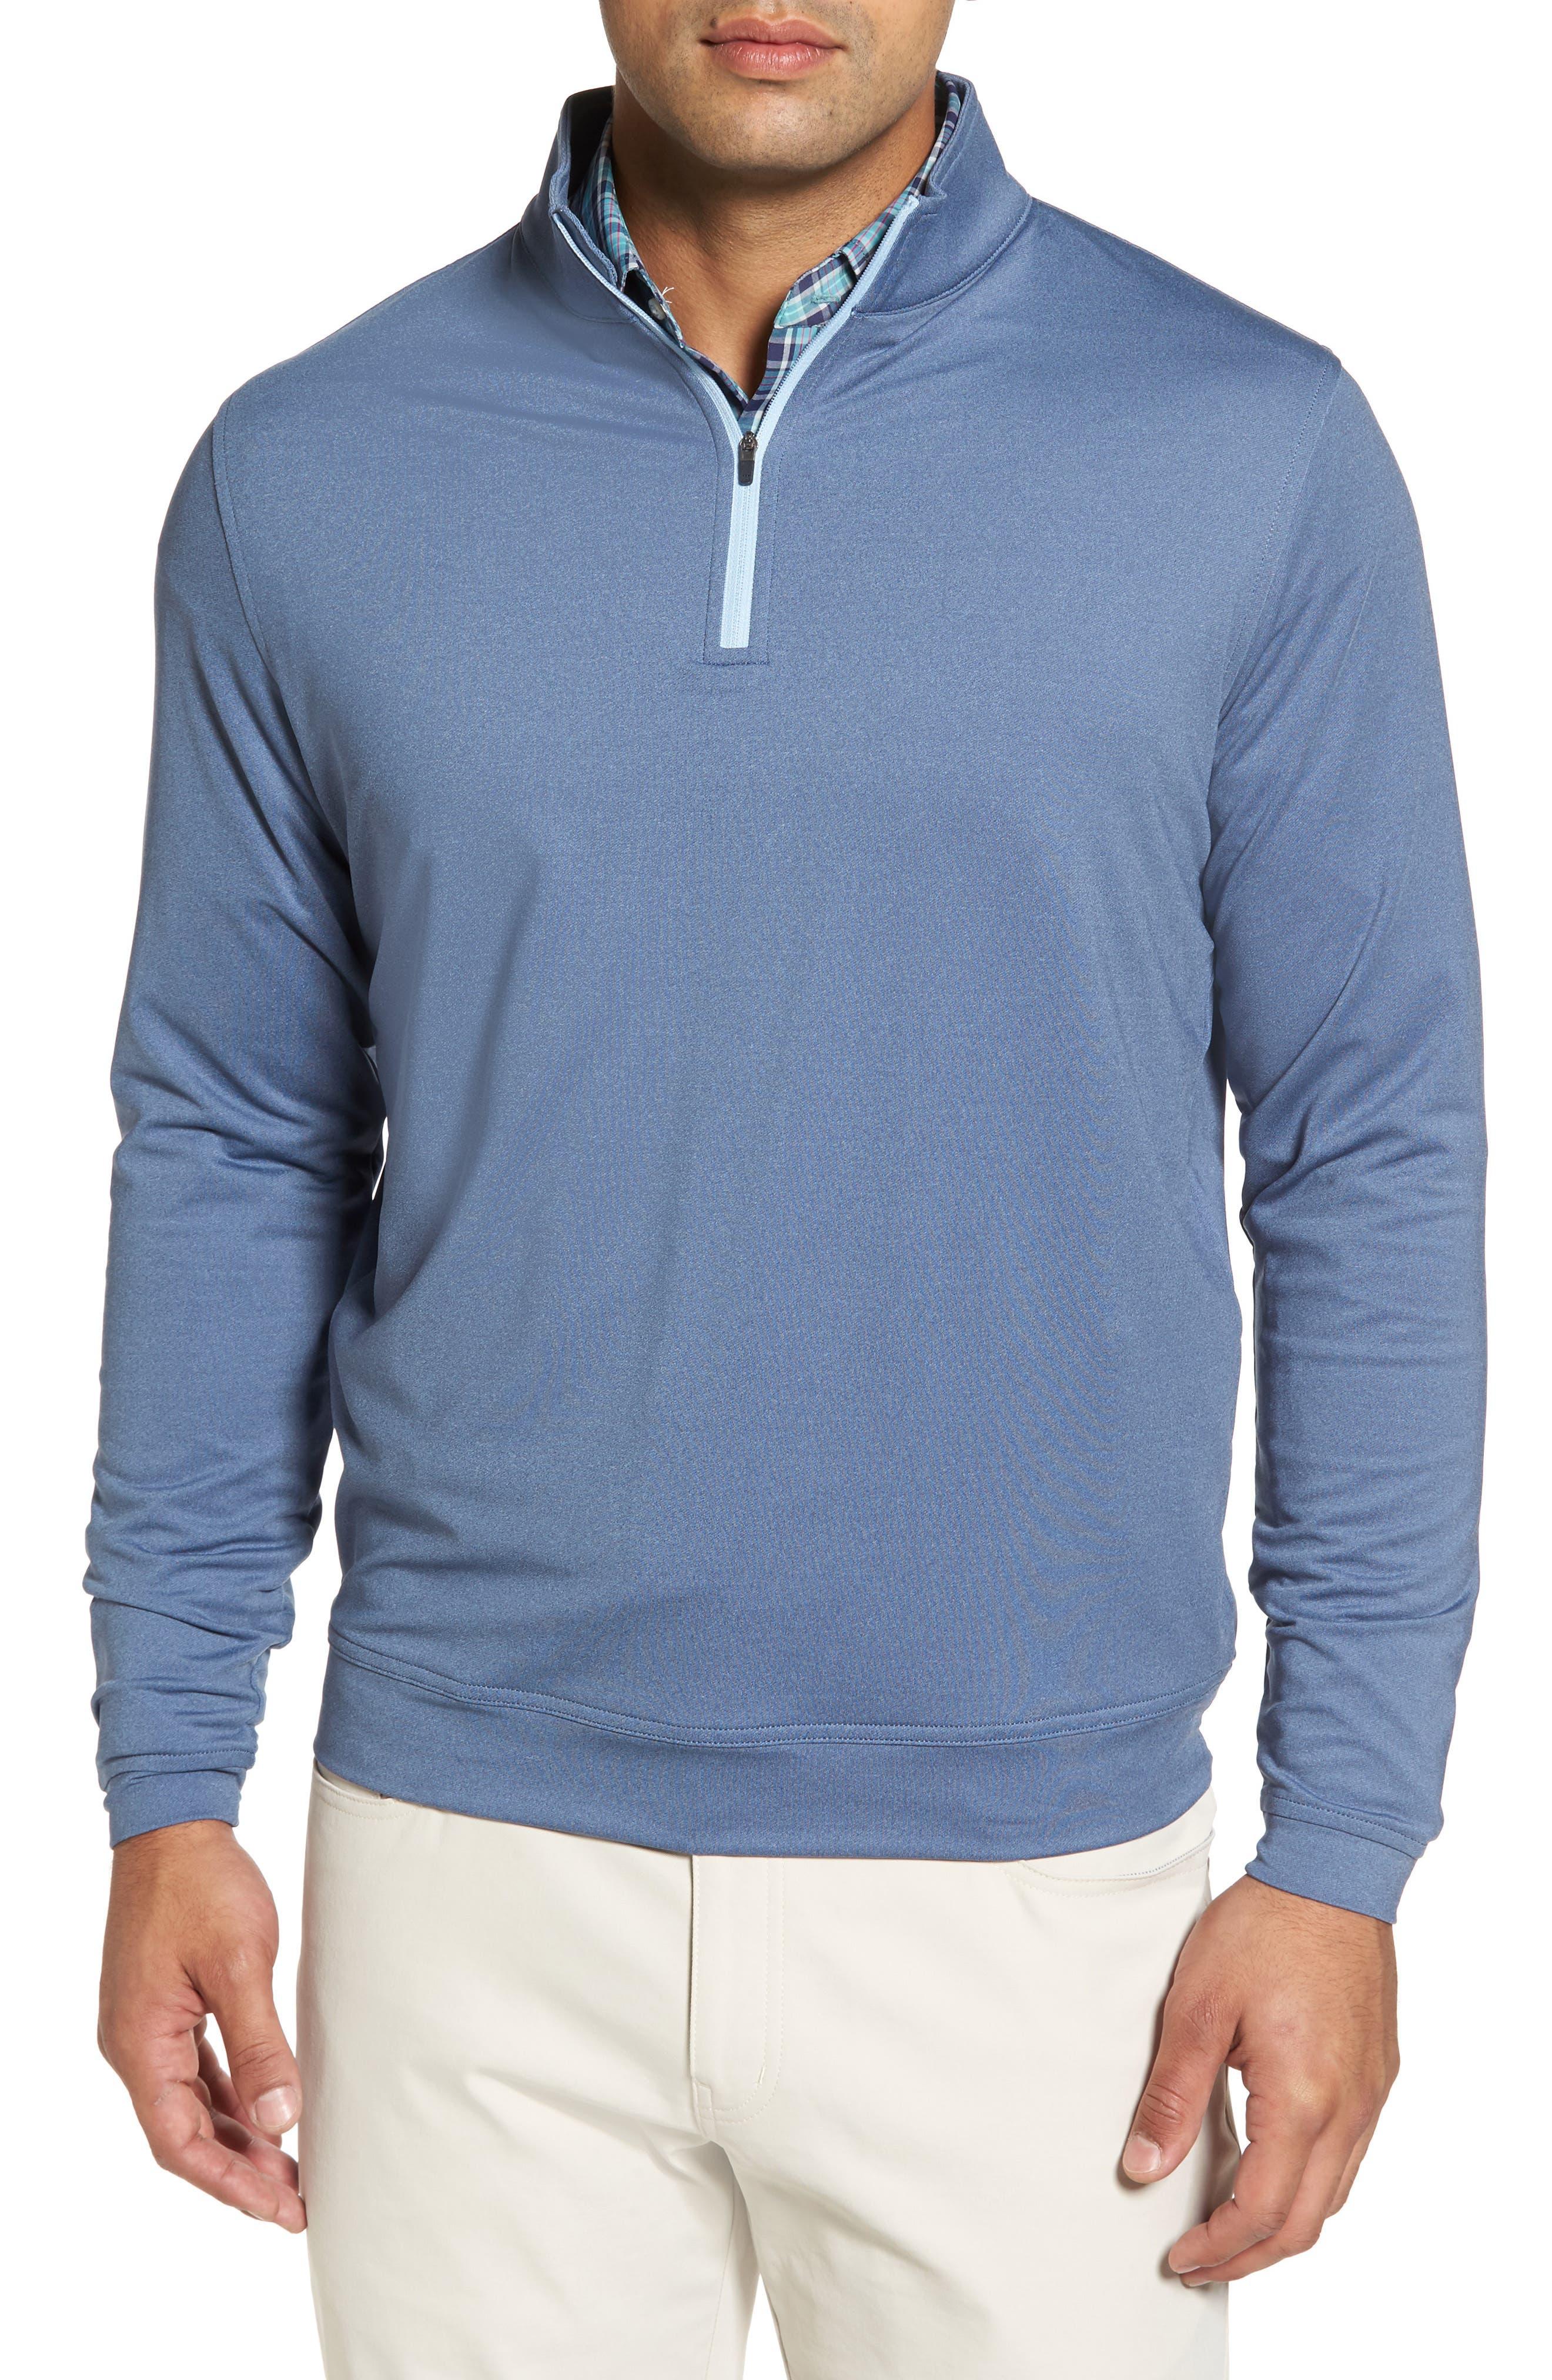 Alternate Image 1 Selected - Peter Millar Perth Quarter Zip Stretch Pullover